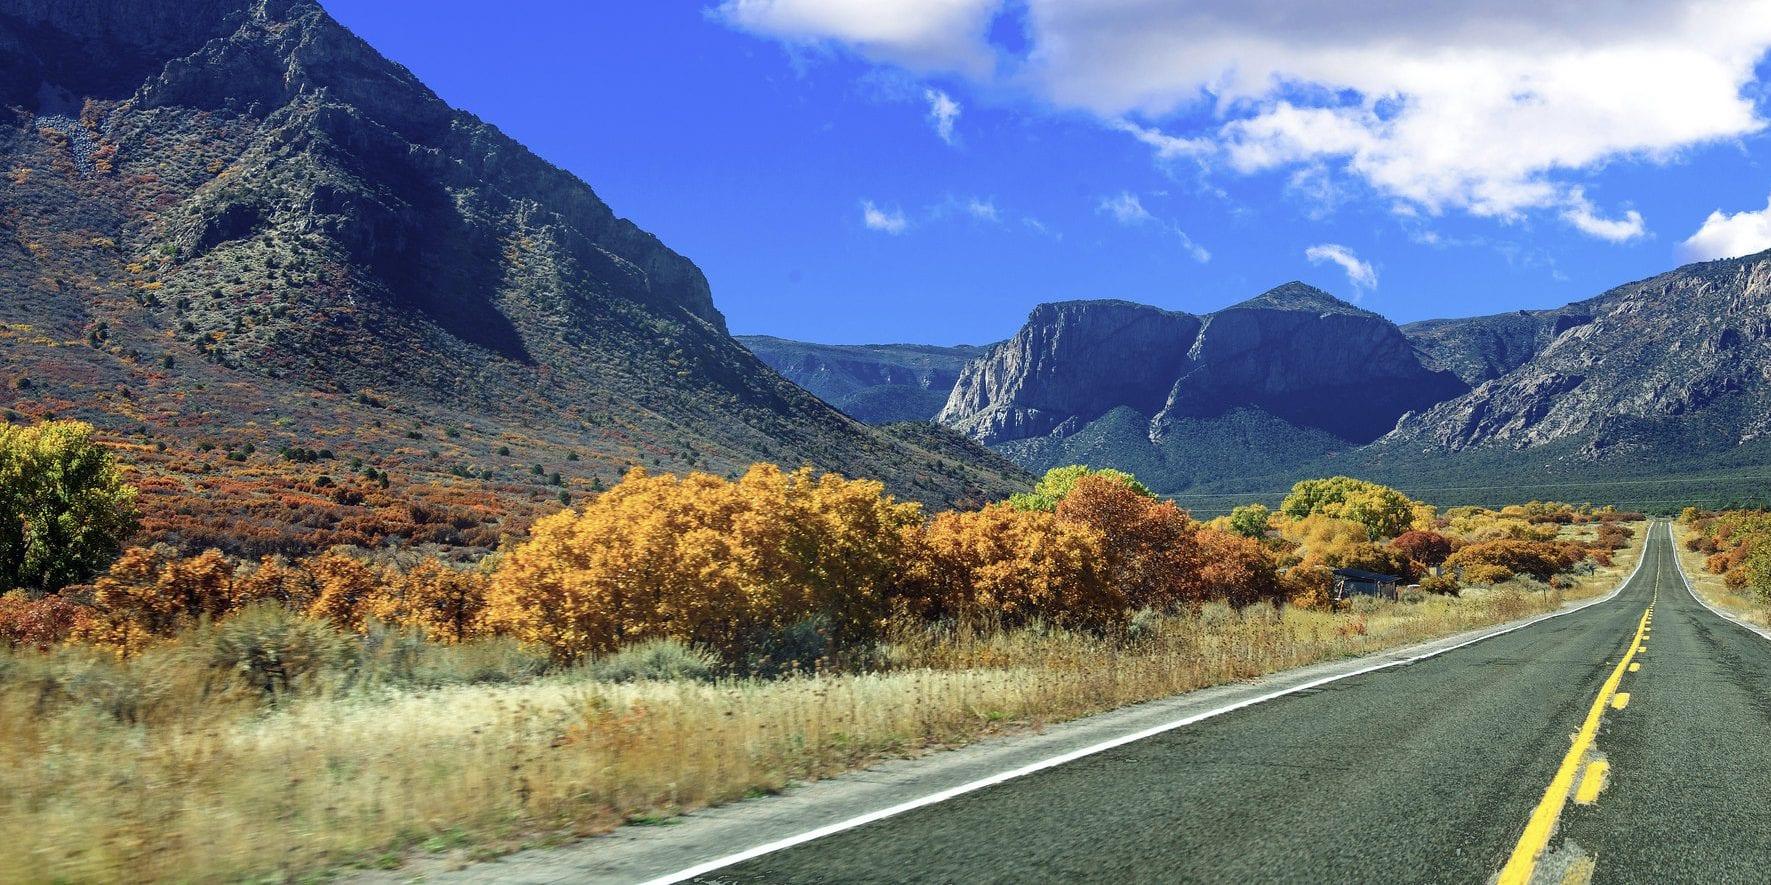 image of highway 141